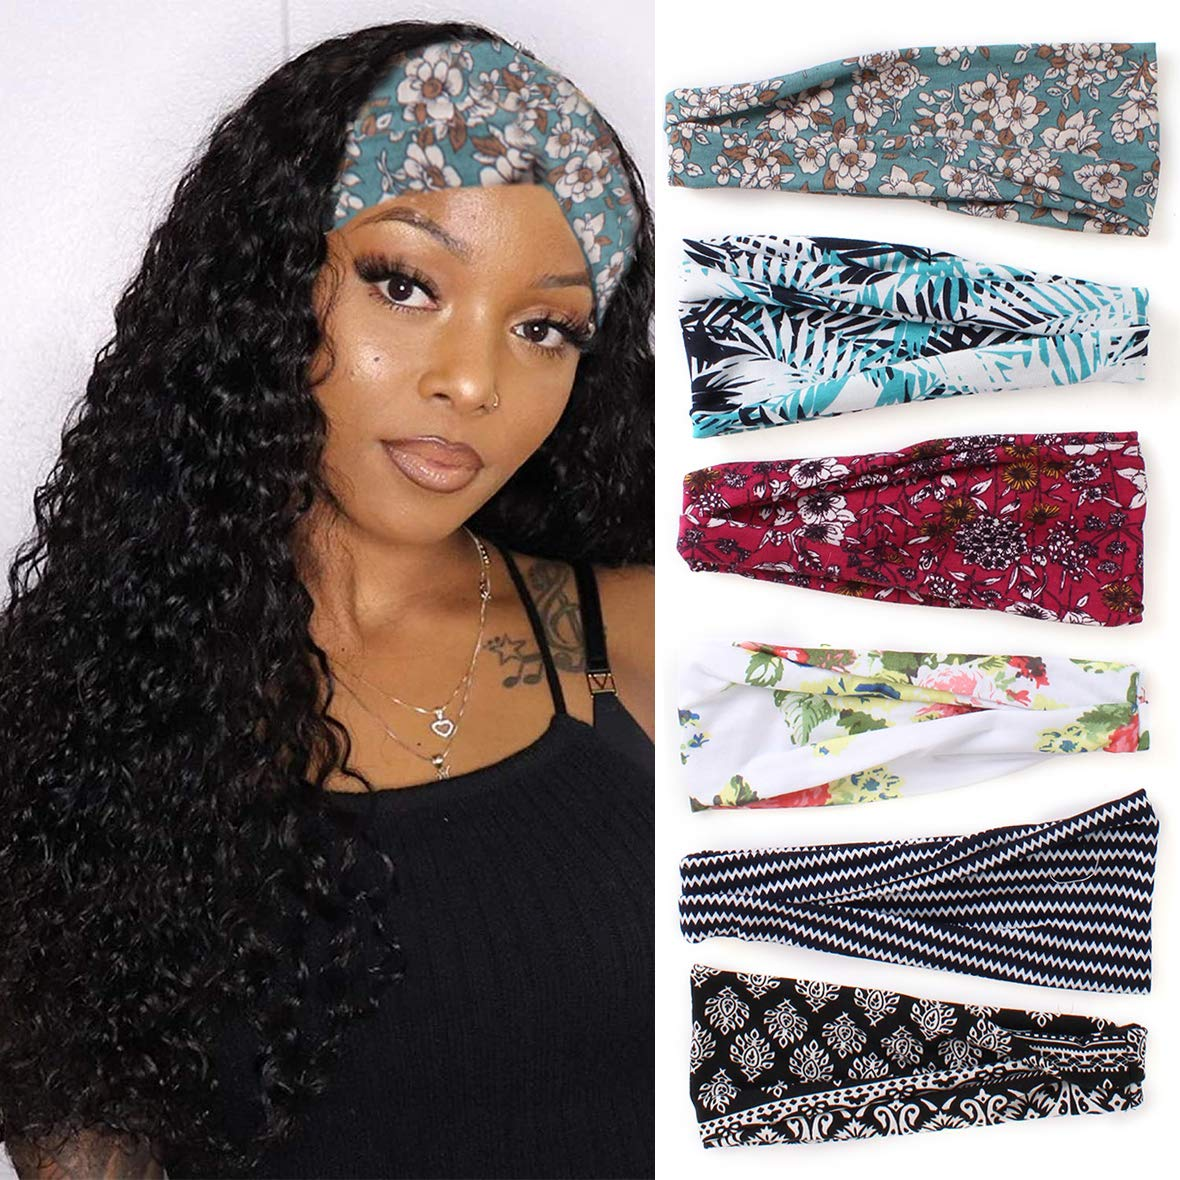 Kachanaa 6 Pack Boho Criss Cross Headbands Wig Vintage Elastic Bandana Headbands Hair Band Head Wrap for Women for Yoga Outdoor Sport Accessories(S4) : Beauty